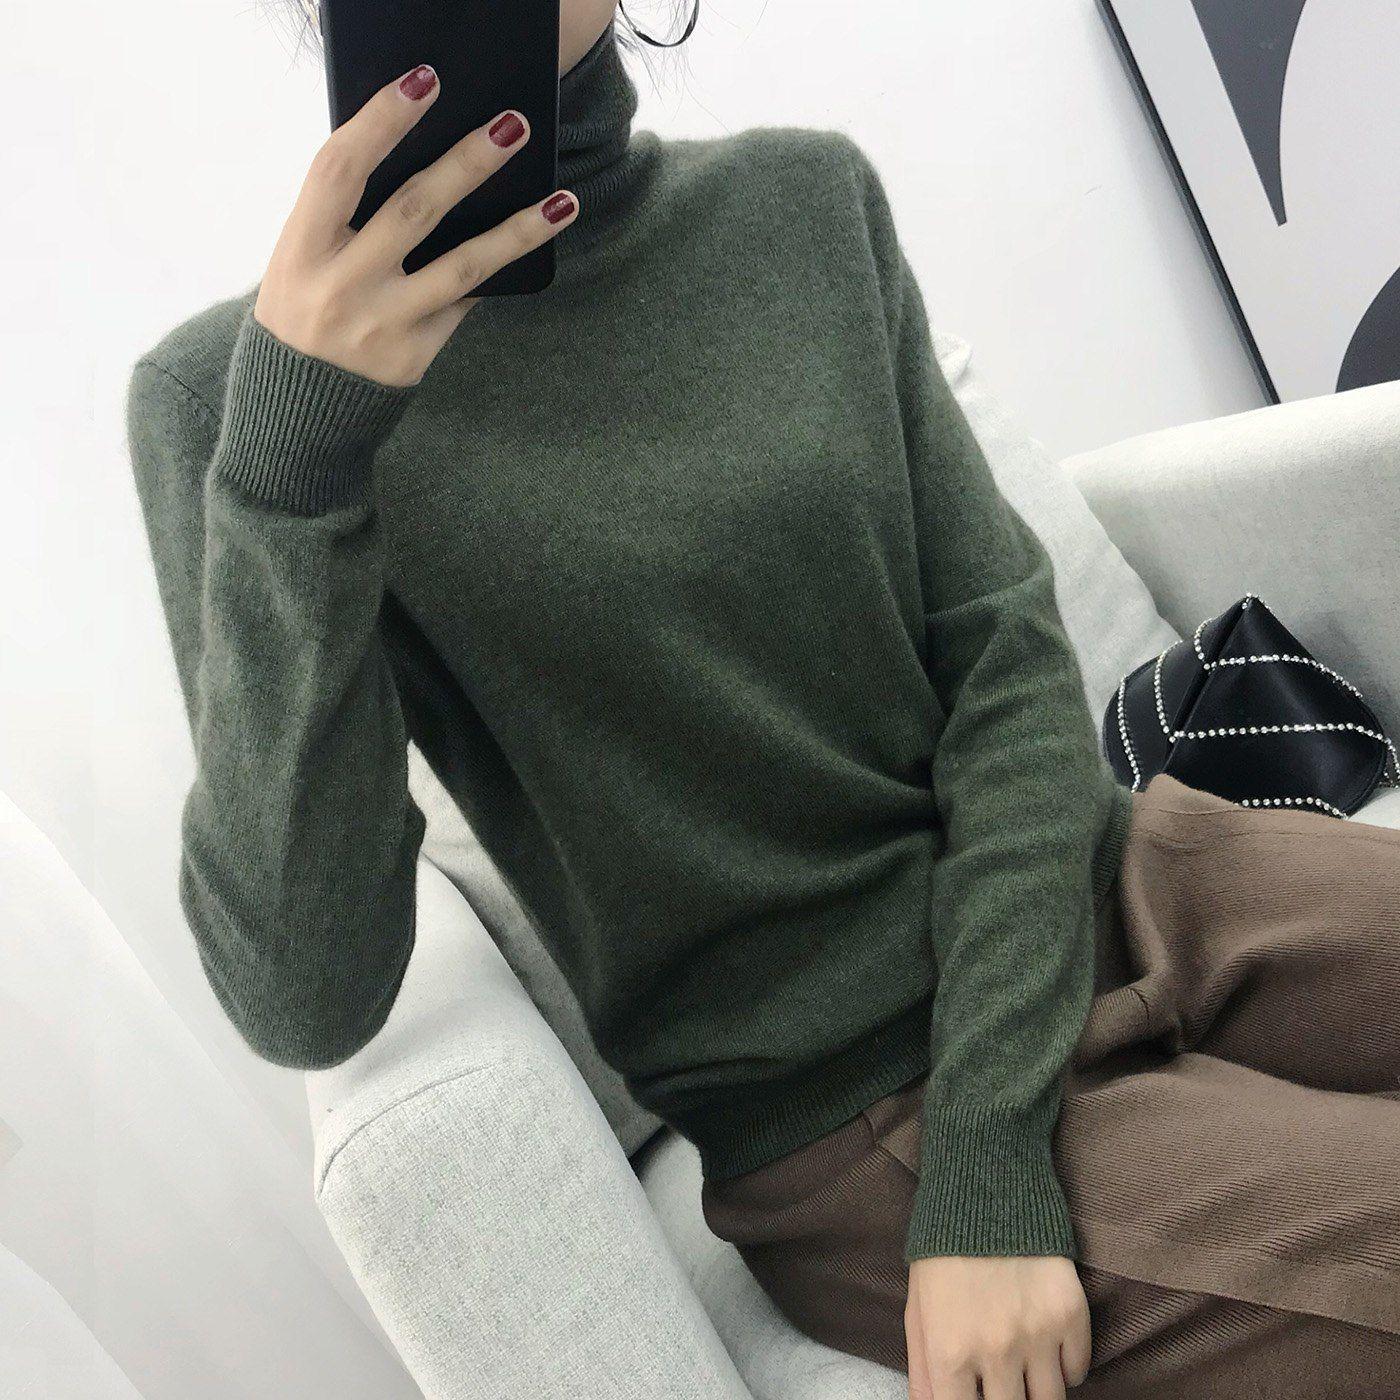 022c6107c8aa22 2018 Cashmere Sweater Women Turtleneck Women s Knitted Turtleneck Winter  Cashmere Sweater For Women Warm Sweaters Female  алиэкспресс  aliexpress